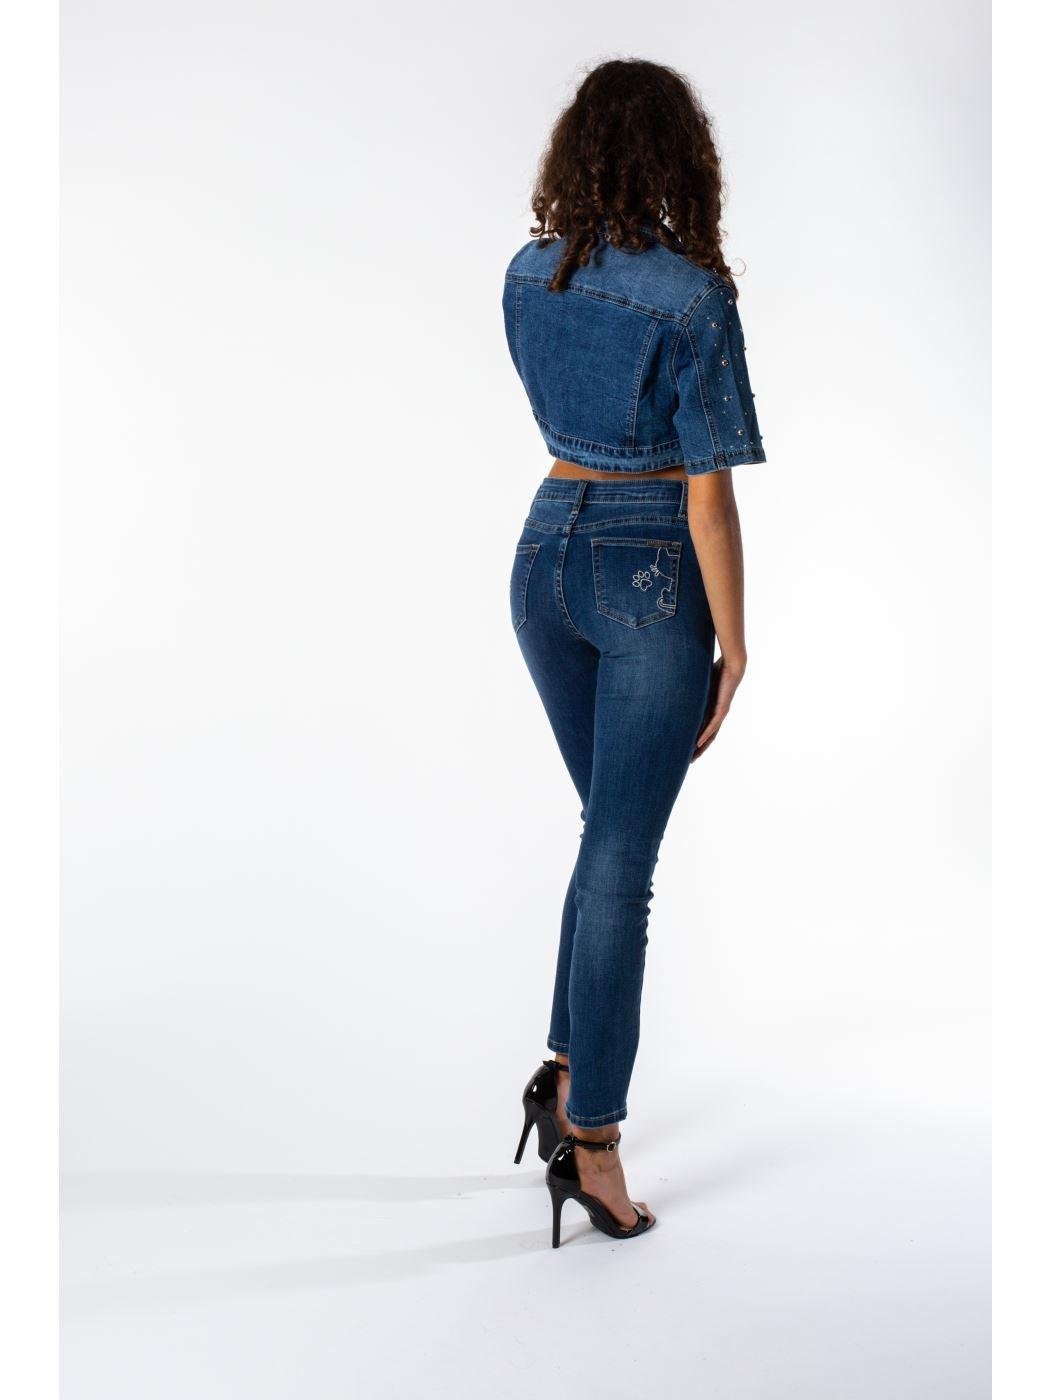 9d83578736 MIMI' MUA' Firenze JRE9-6028 Giubbotto jeans blu con borchie